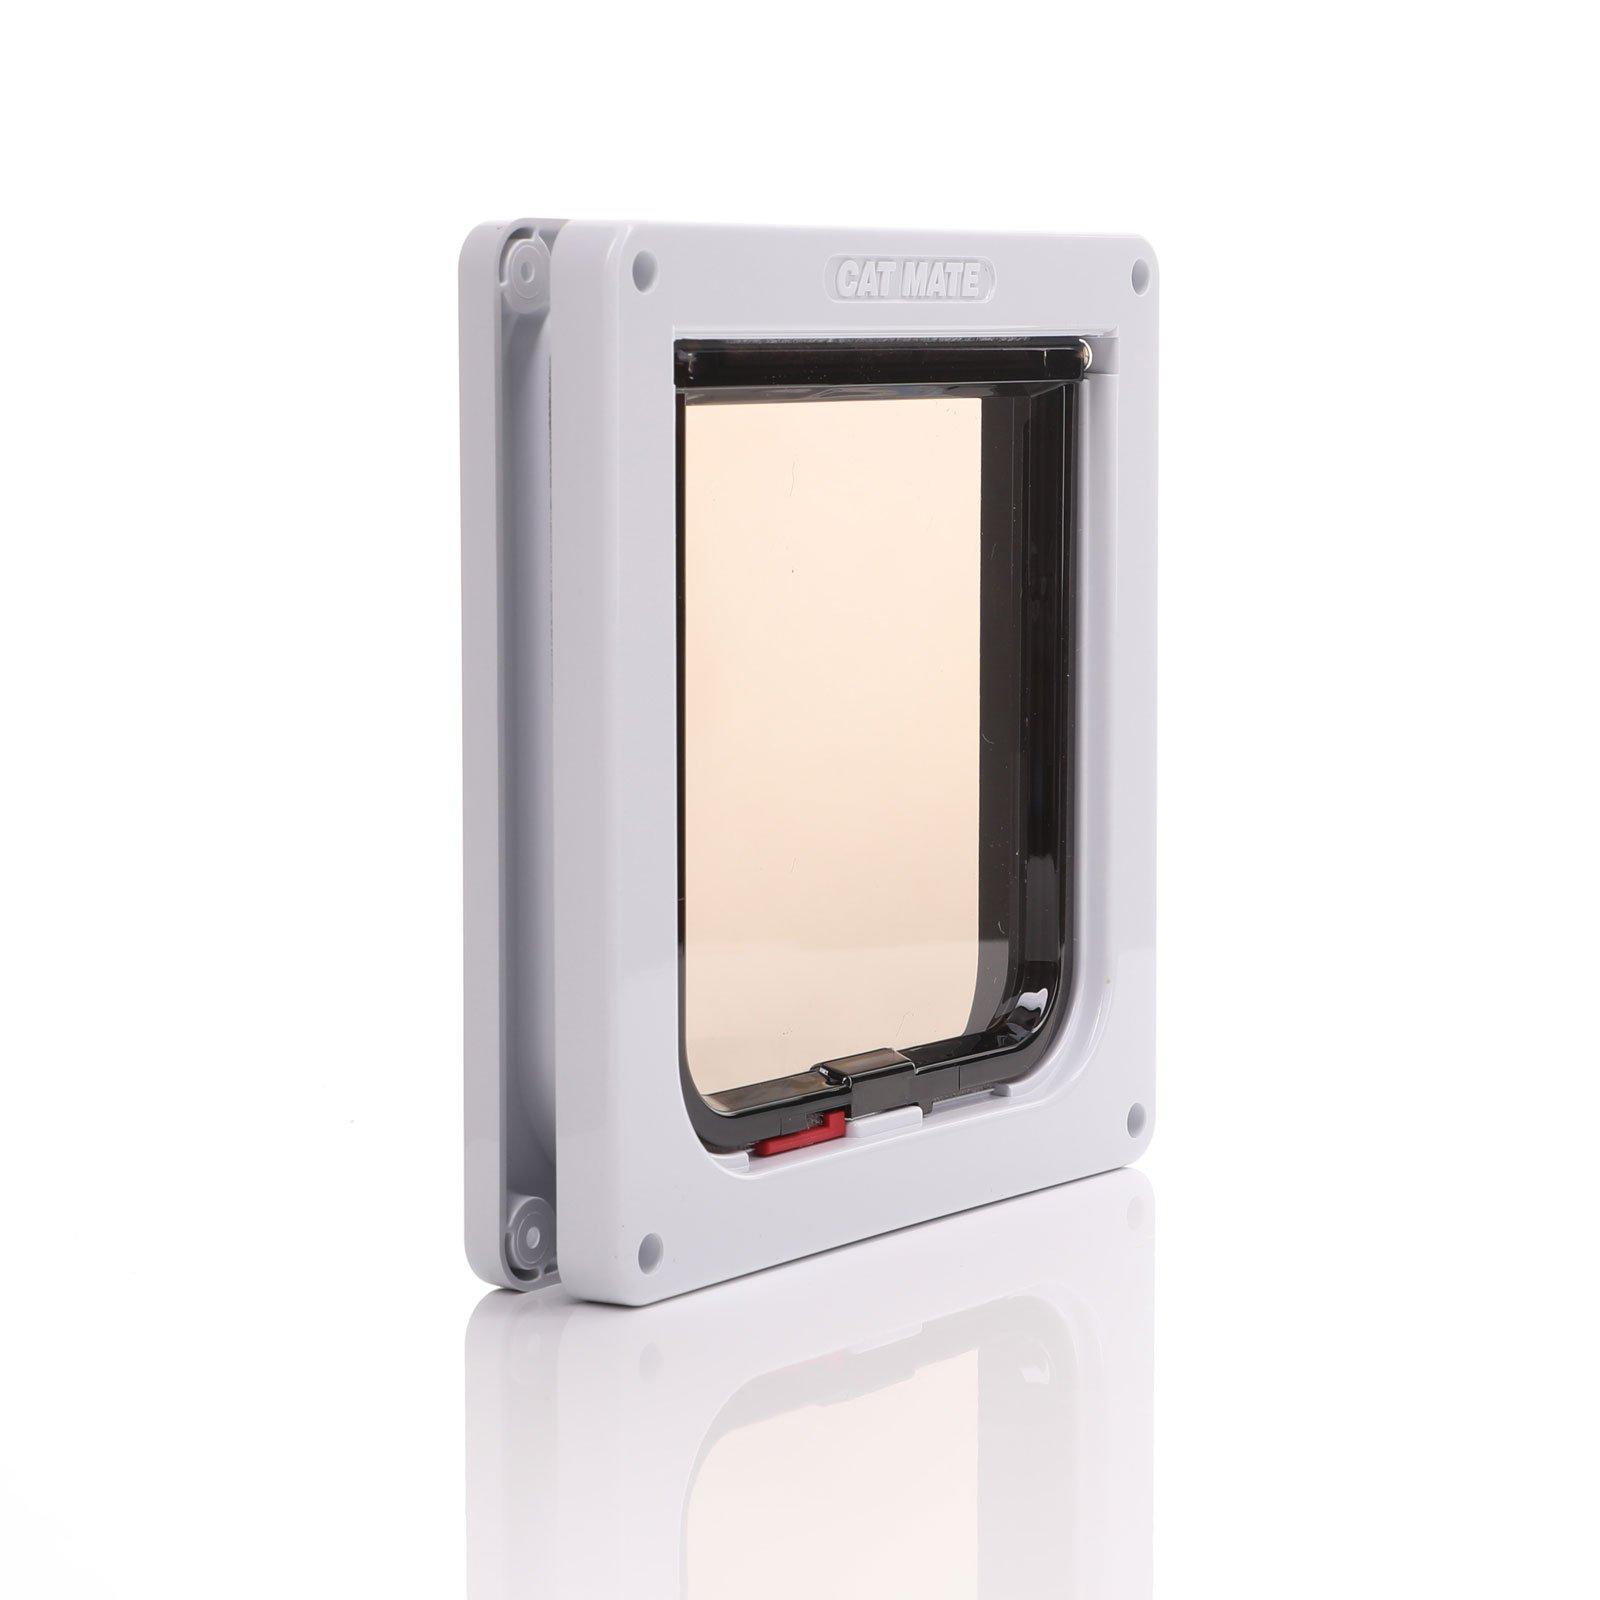 Thin max 12mm panel fitting cat door.